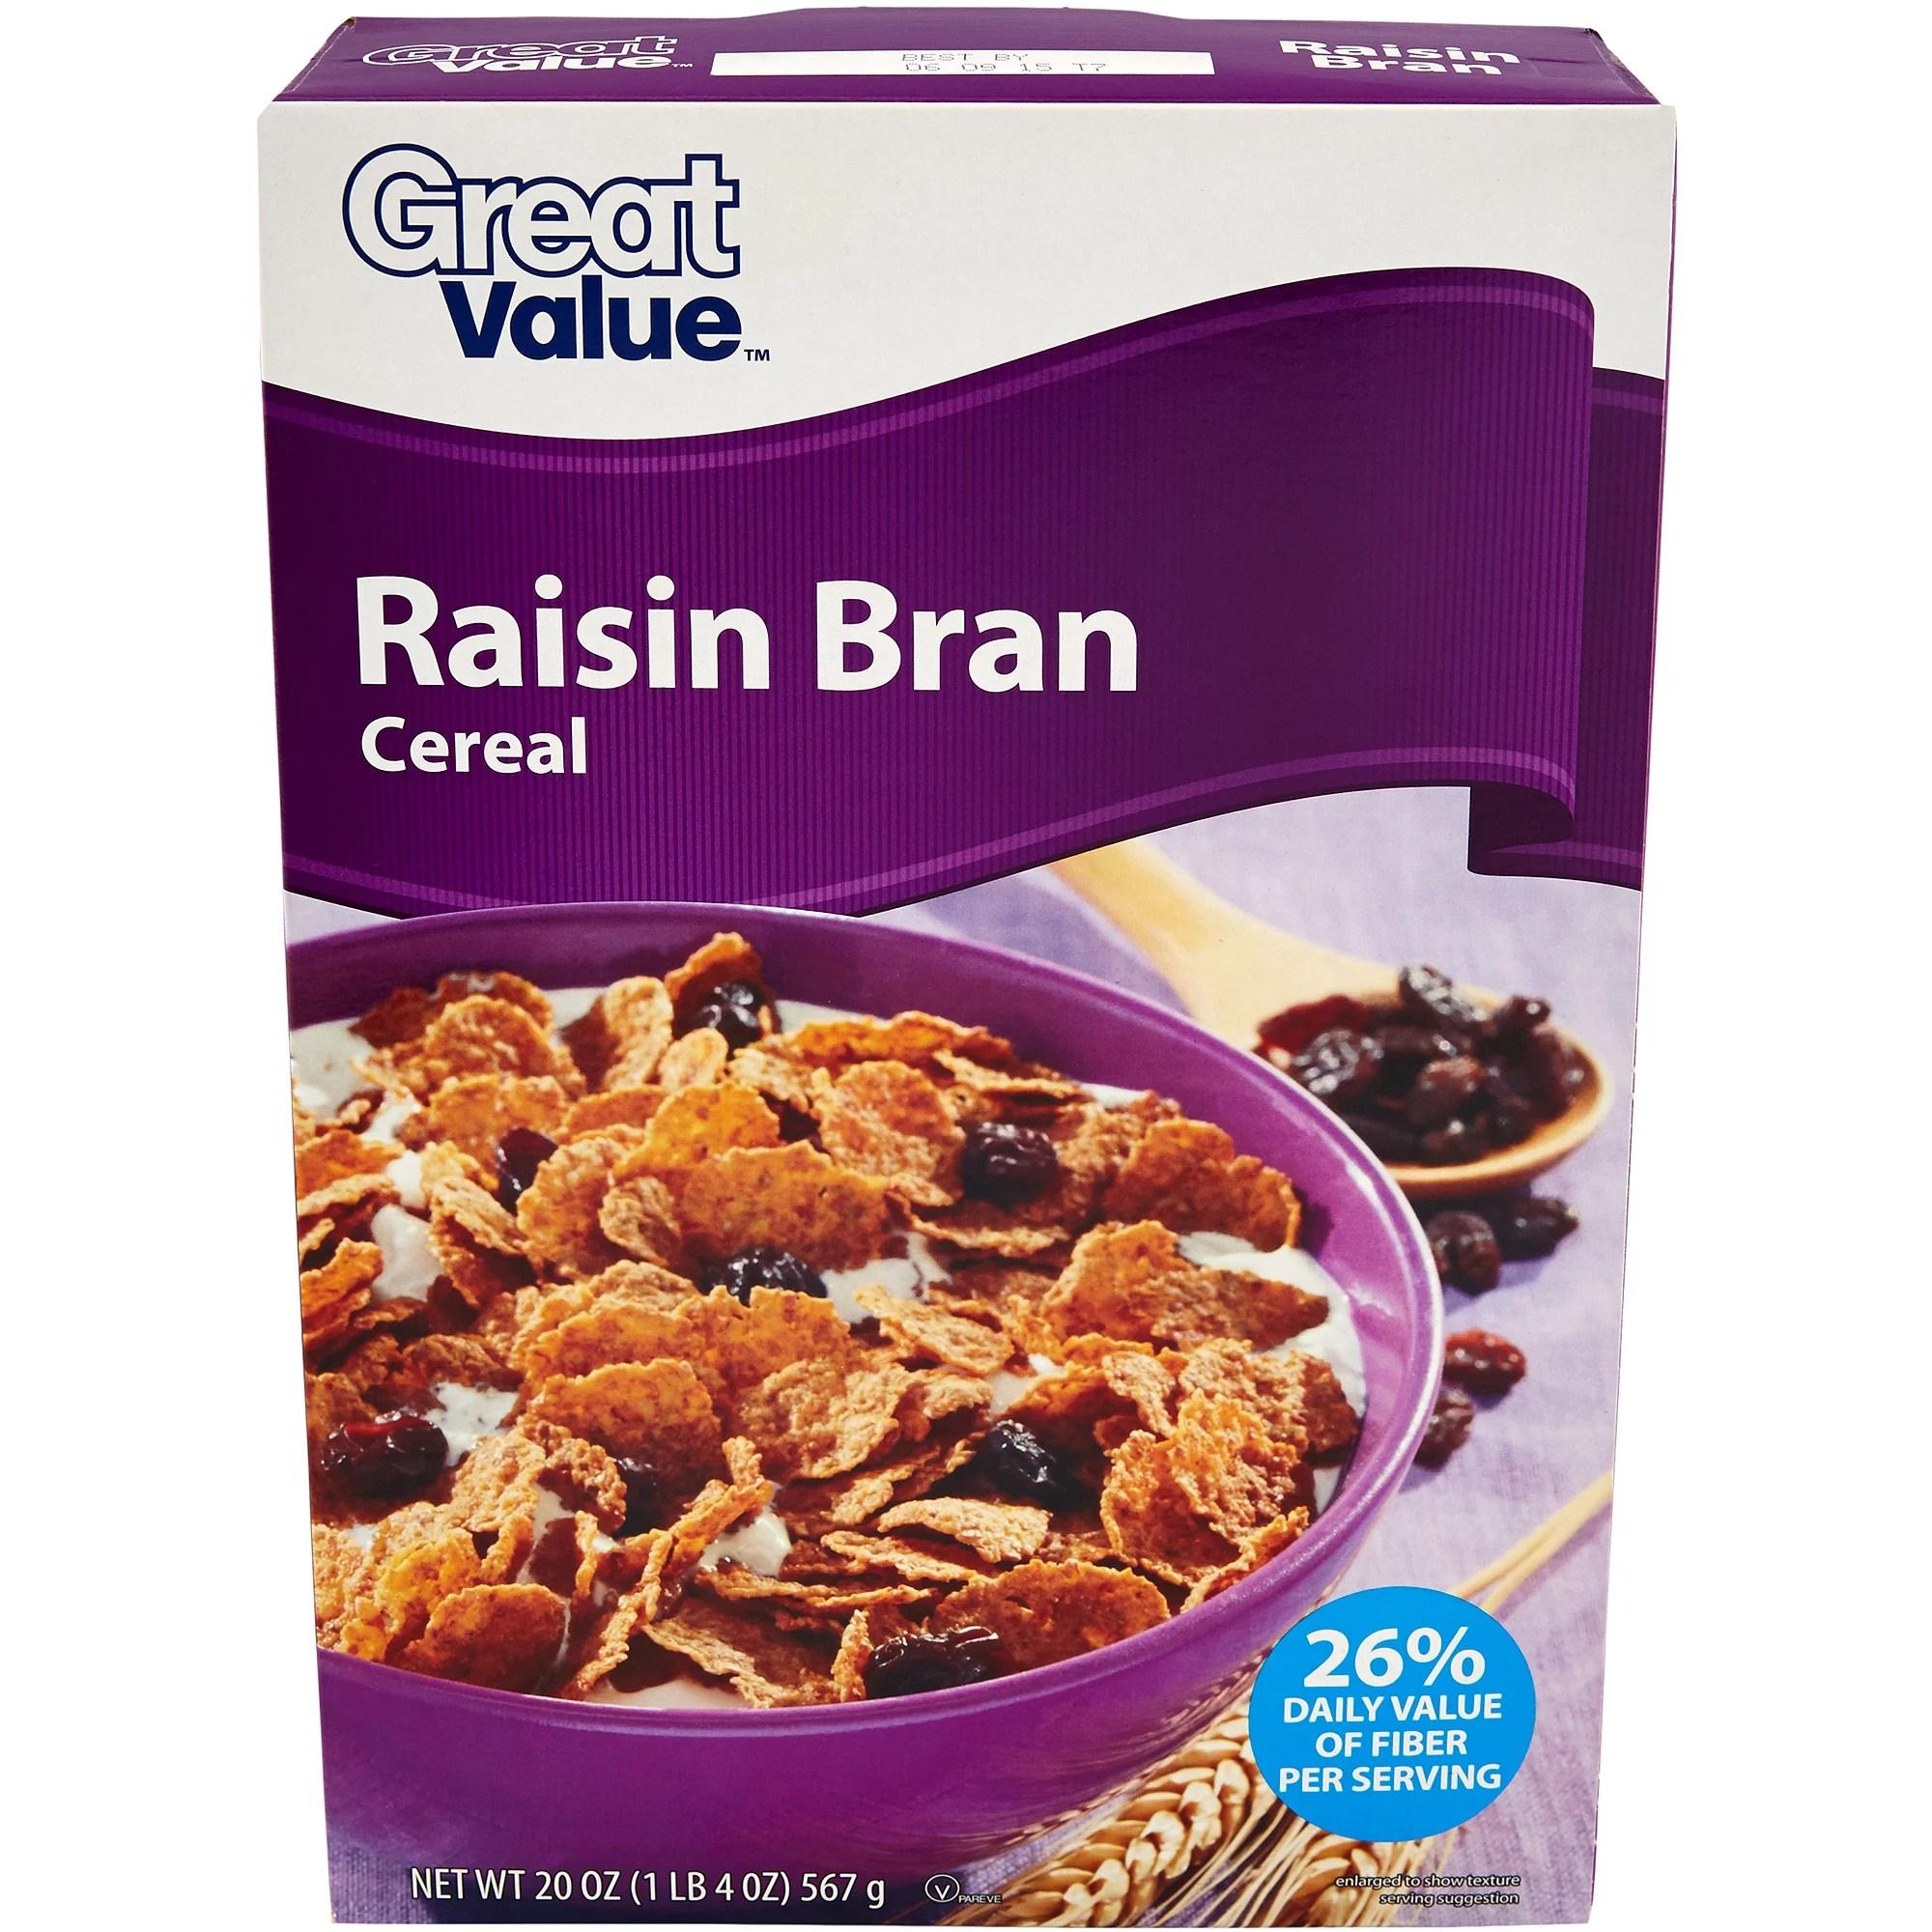 Great Value Raisin Bran Cereal 20 oz - Walmart.com